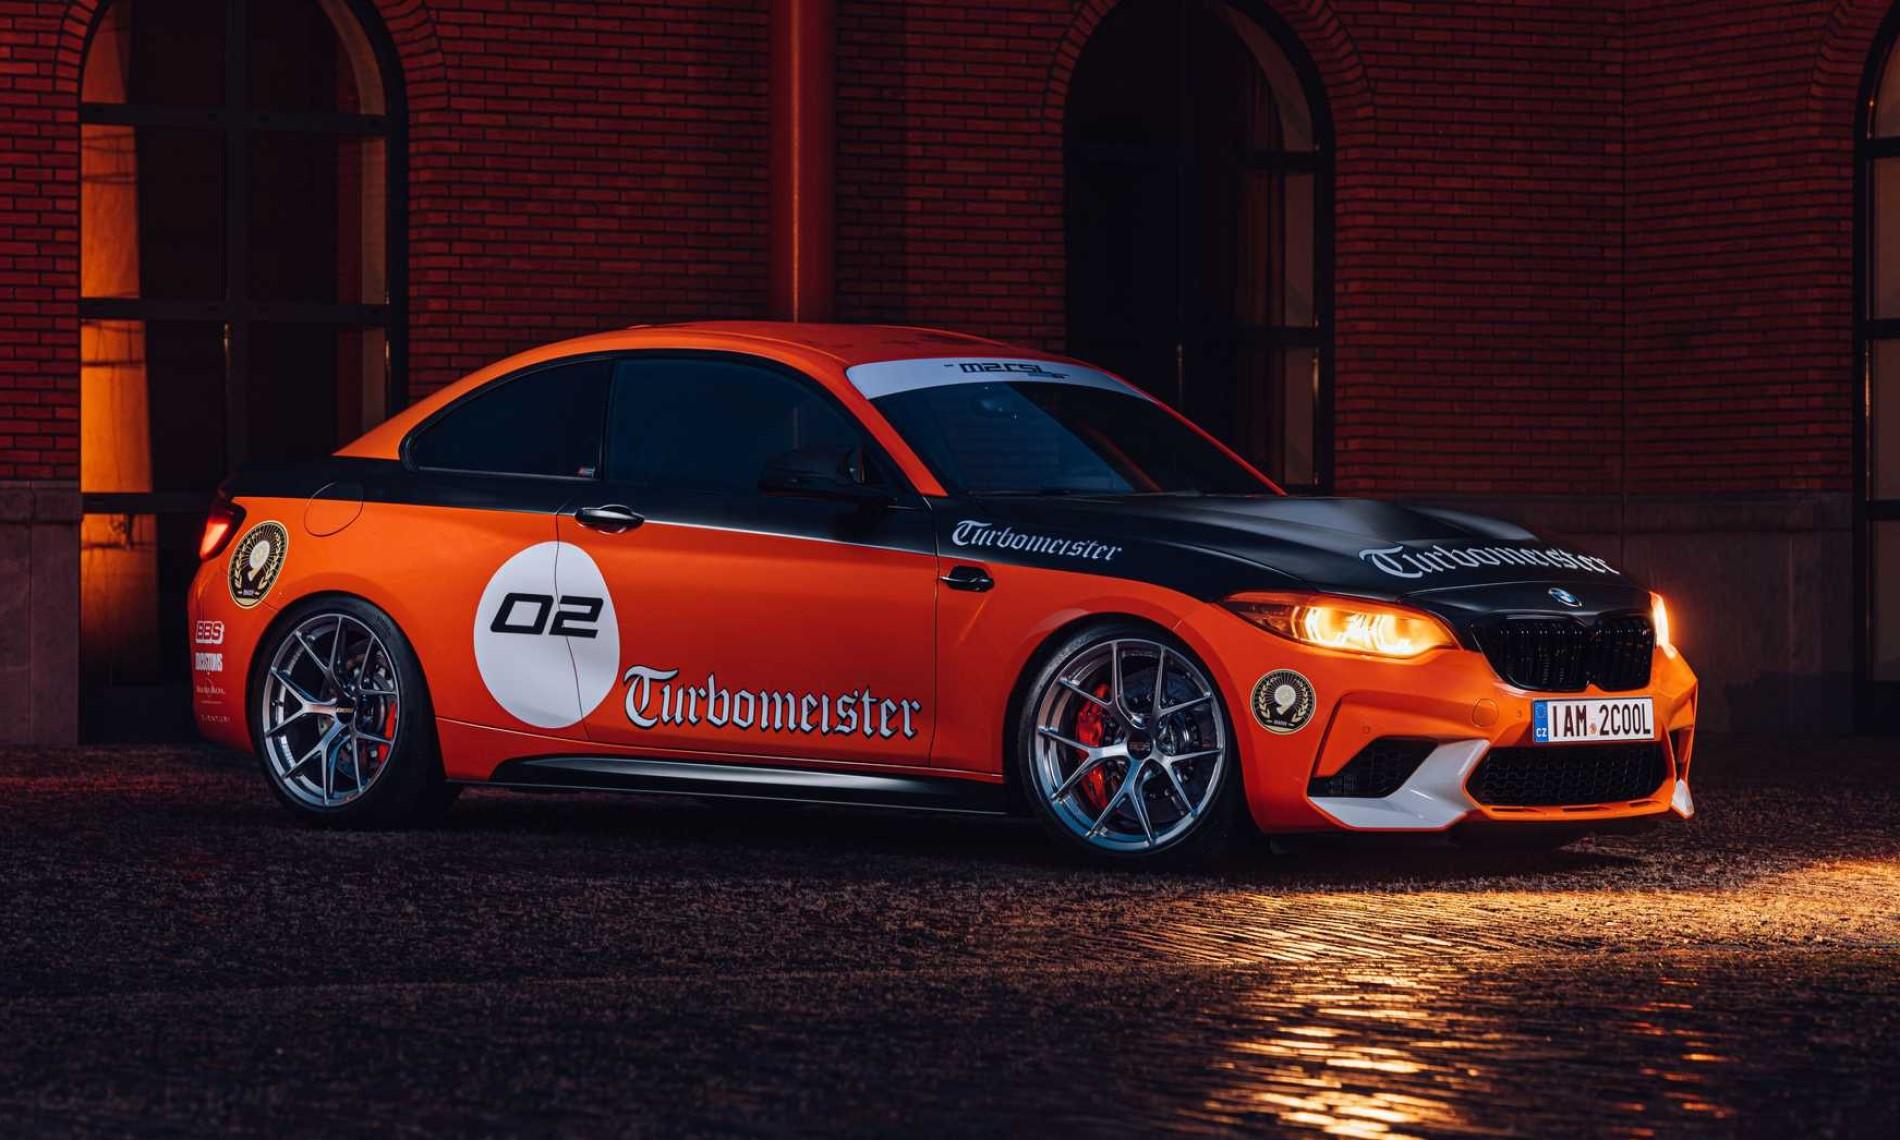 BMW M2 CSL Turbomeister